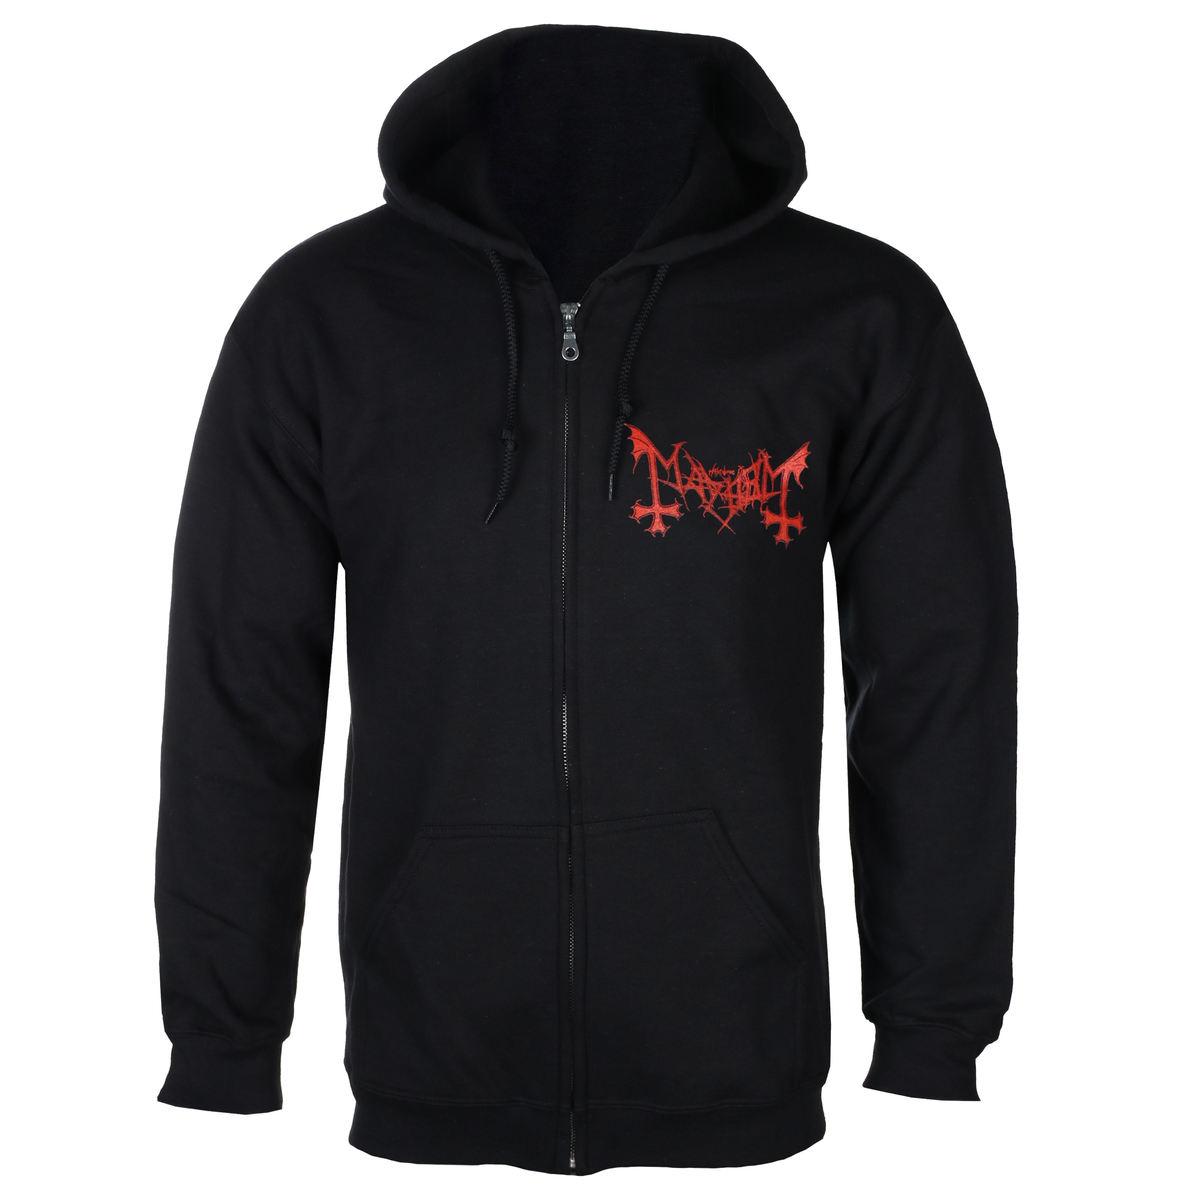 NEW /& OFFICIAL! Mayhem ?Deathcrush/' Zip Up Hoodie